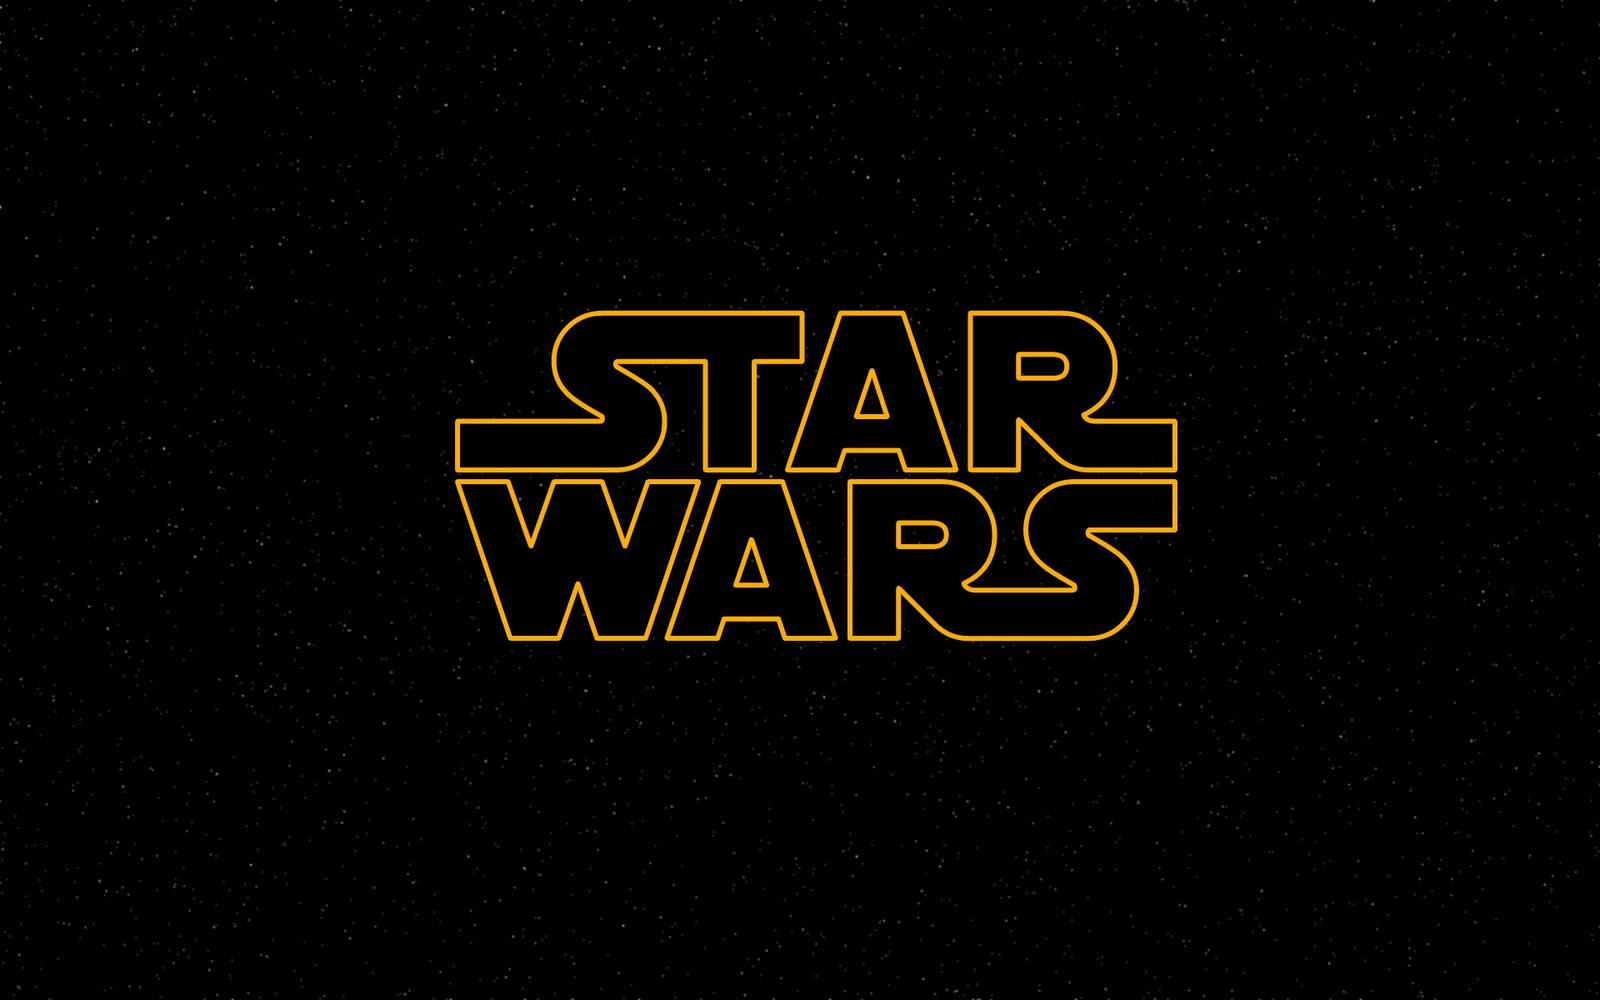 Movie, Star Wars Episode IV: A New Hope(美國, 1977) / 星際大戰四部曲:曙光乍現(台灣) / 星球大战IV:新希望(中國) / 星球大戰:新的希望(香港), 電影劇照